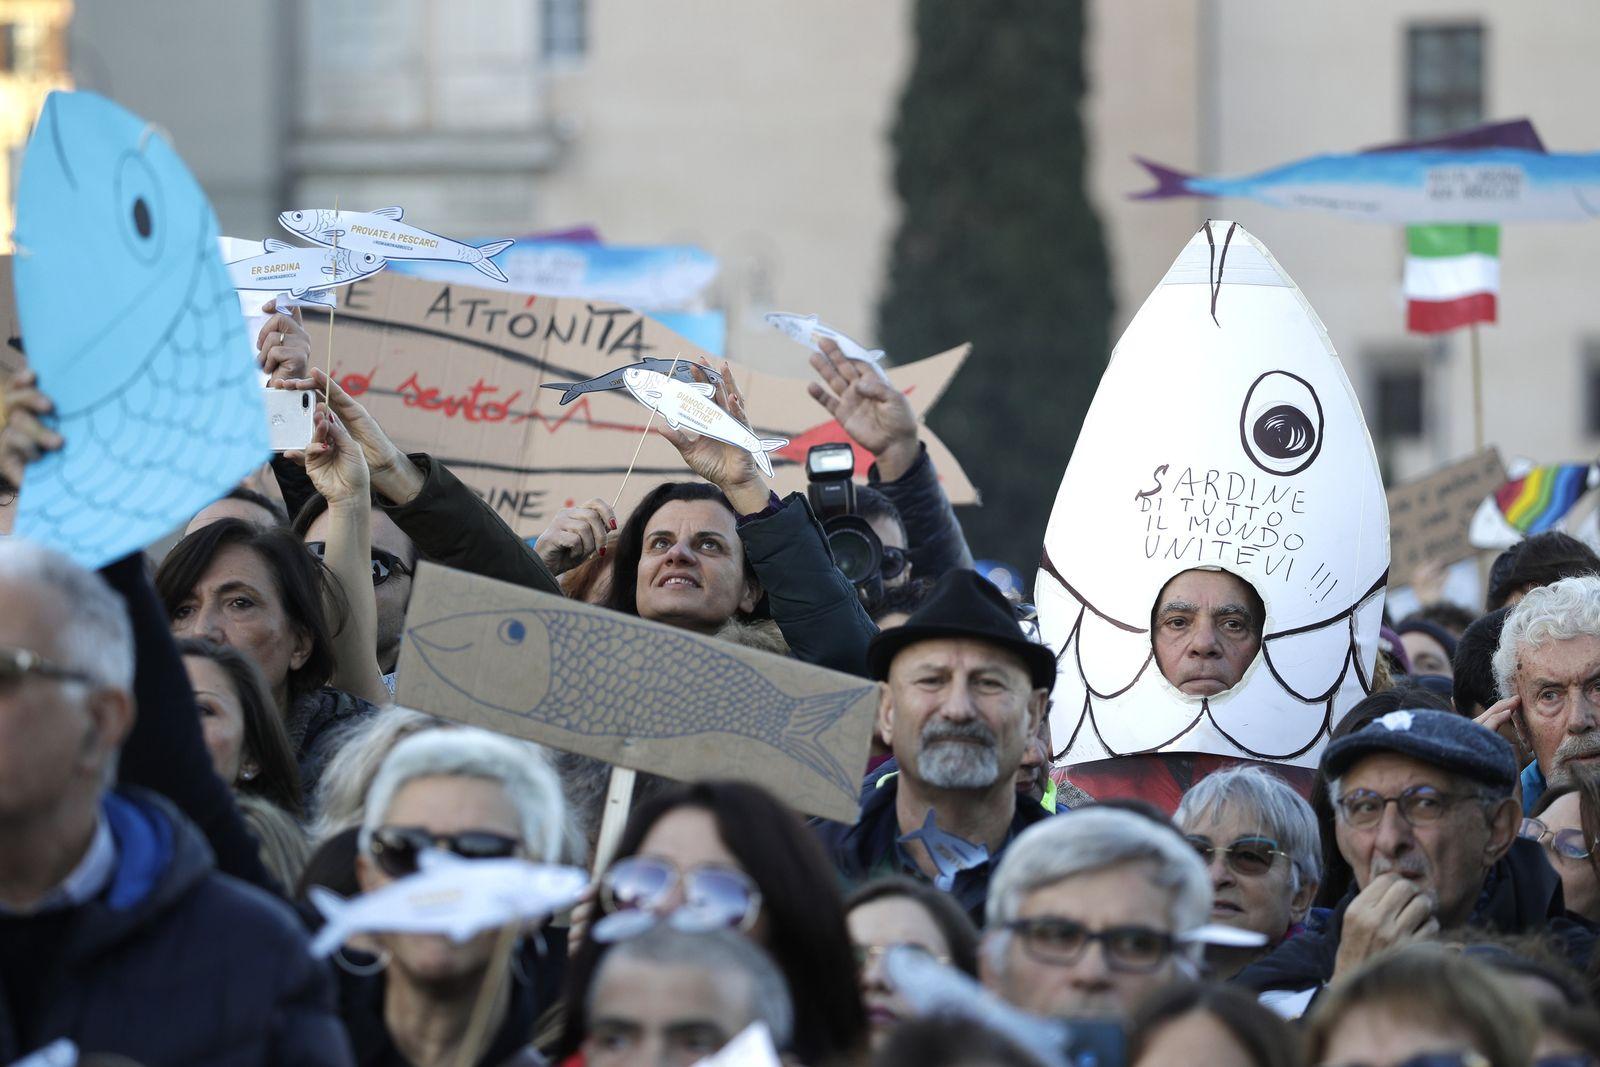 Italy Sardines Rome